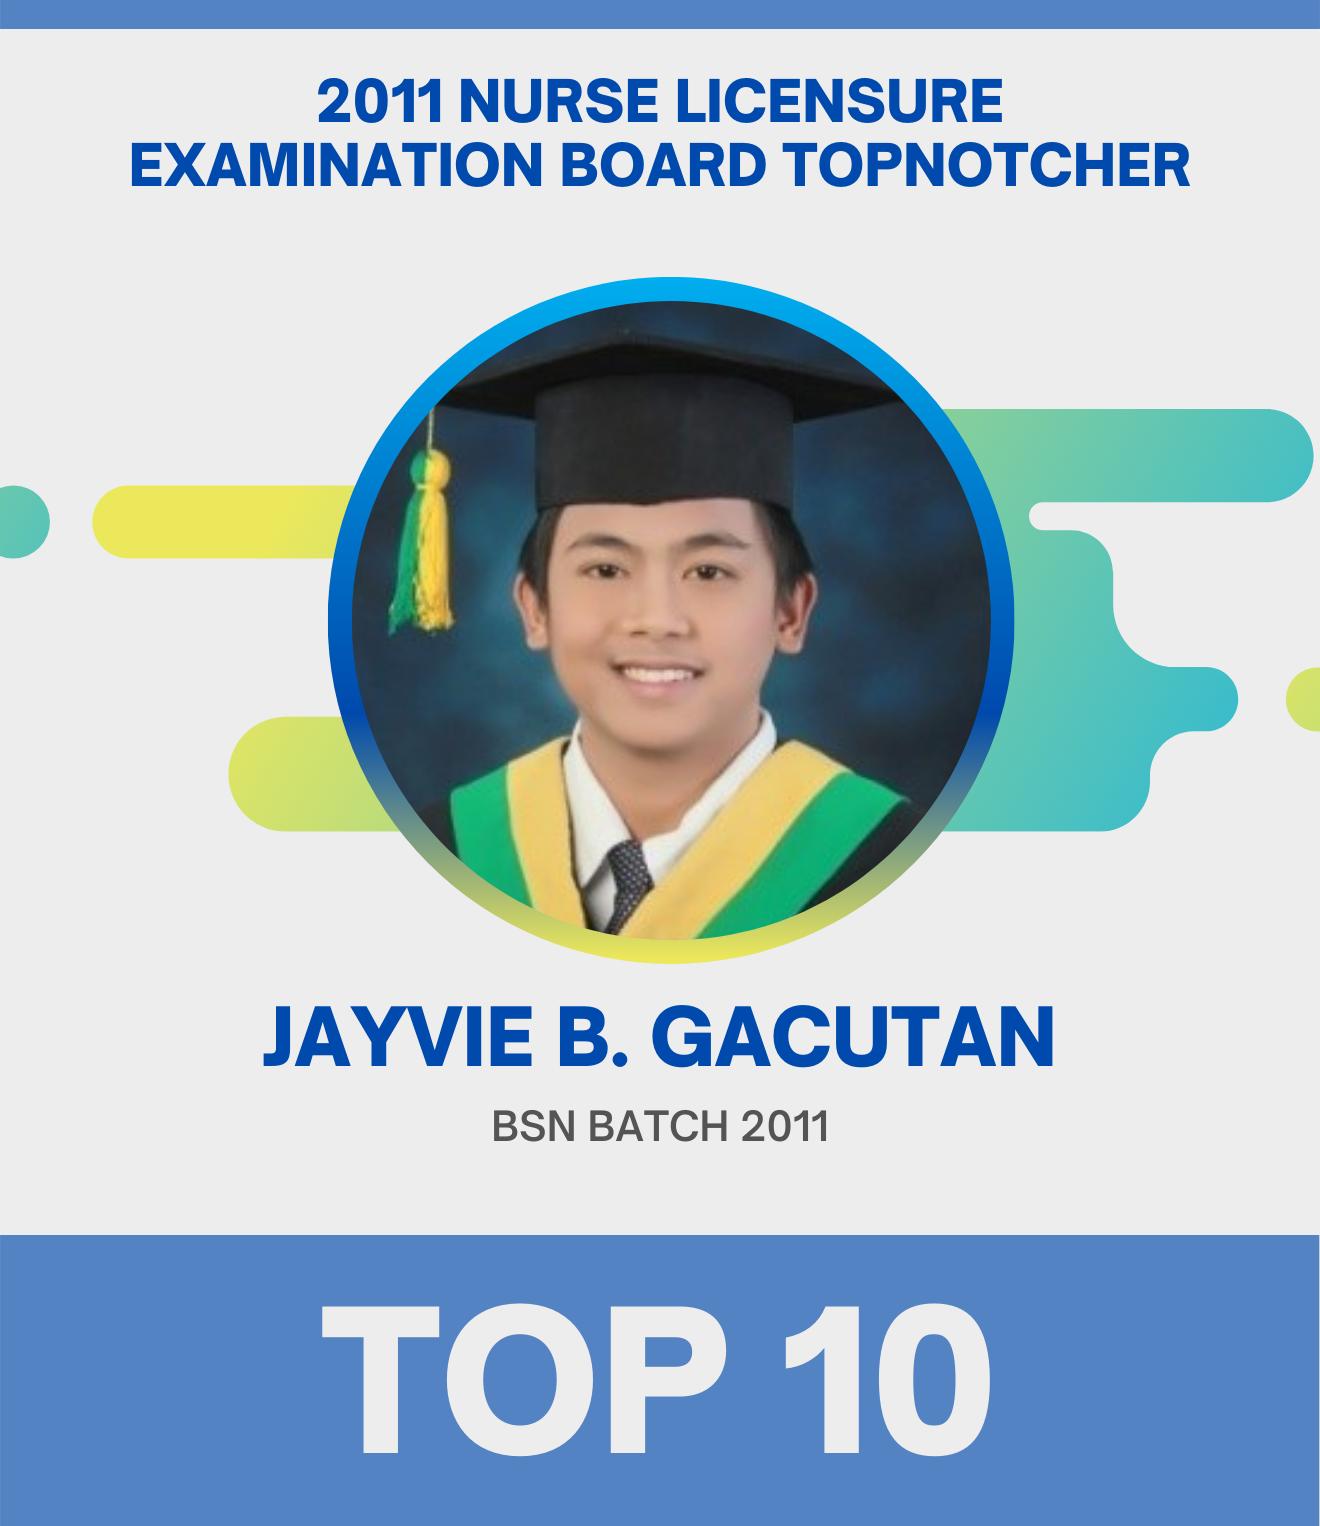 Top 10 - jayvie b. gacutan